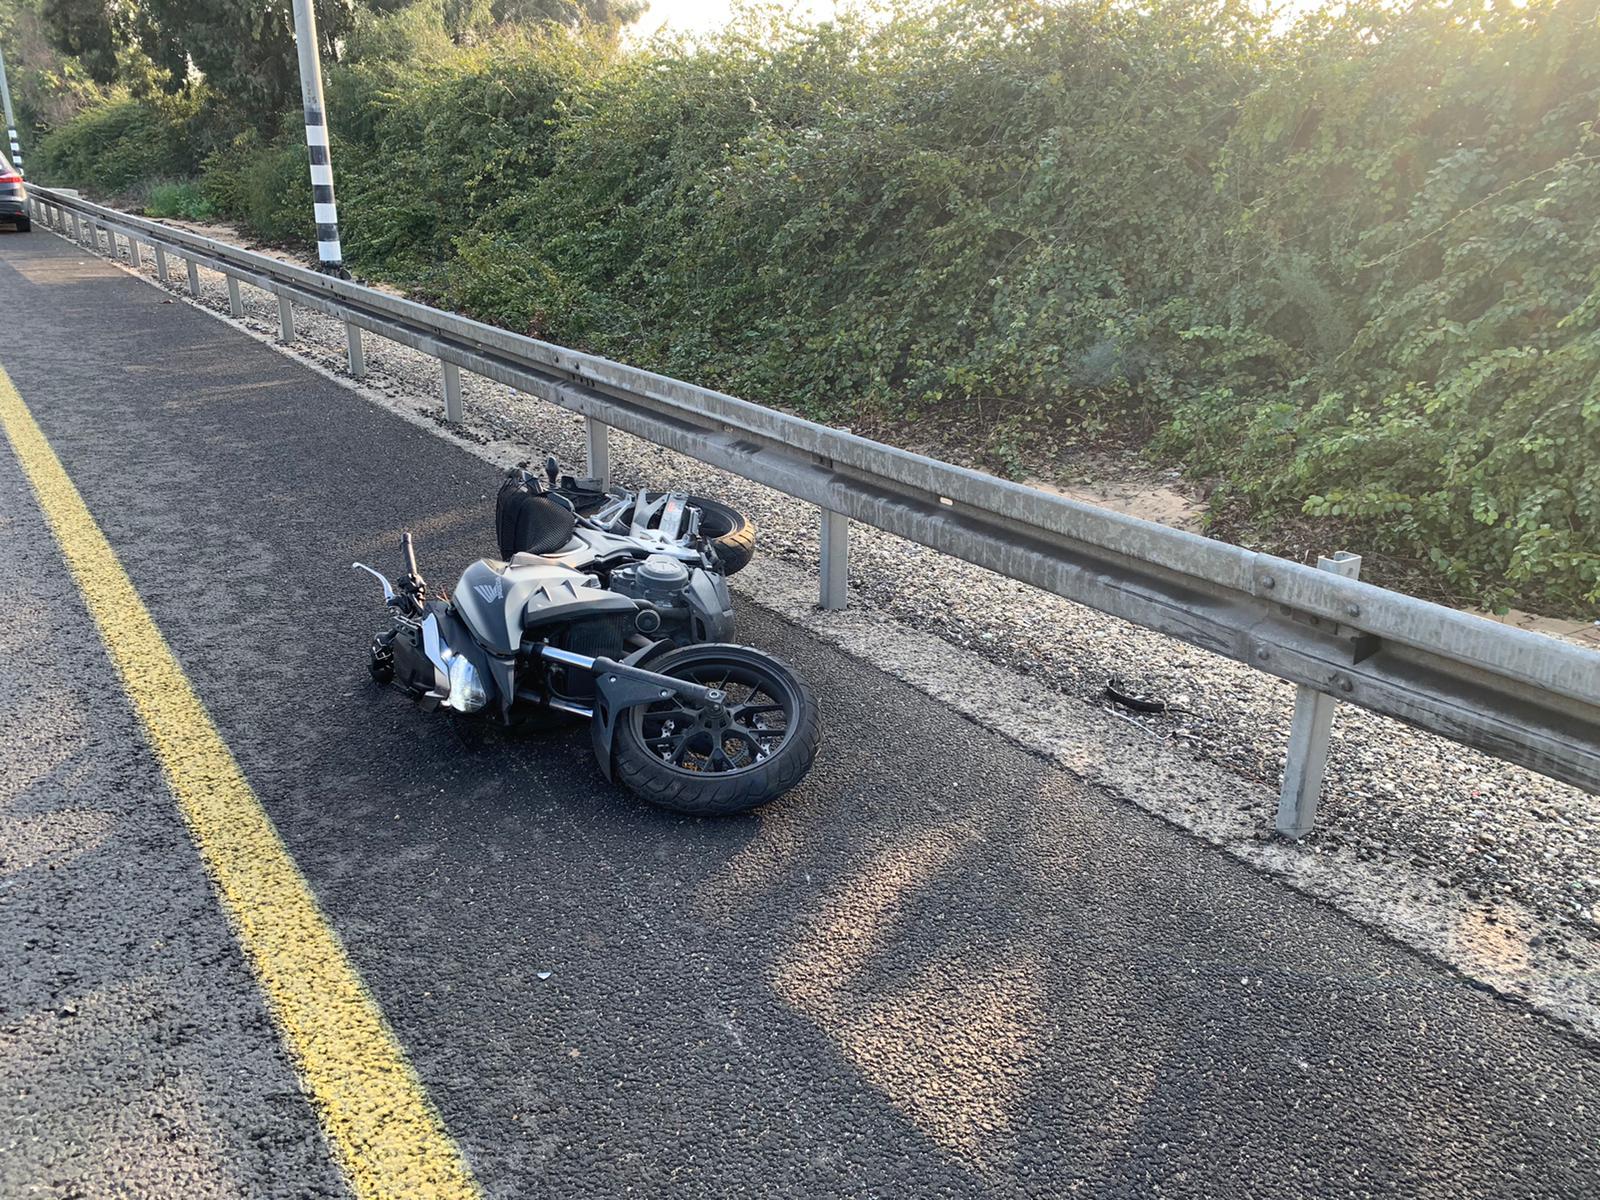 Photo of תאונה קטלנית הבוקר בכביש 40: רוכב אופנוע כבן 44 נהרג סמוך לצומת רחובות מזרח